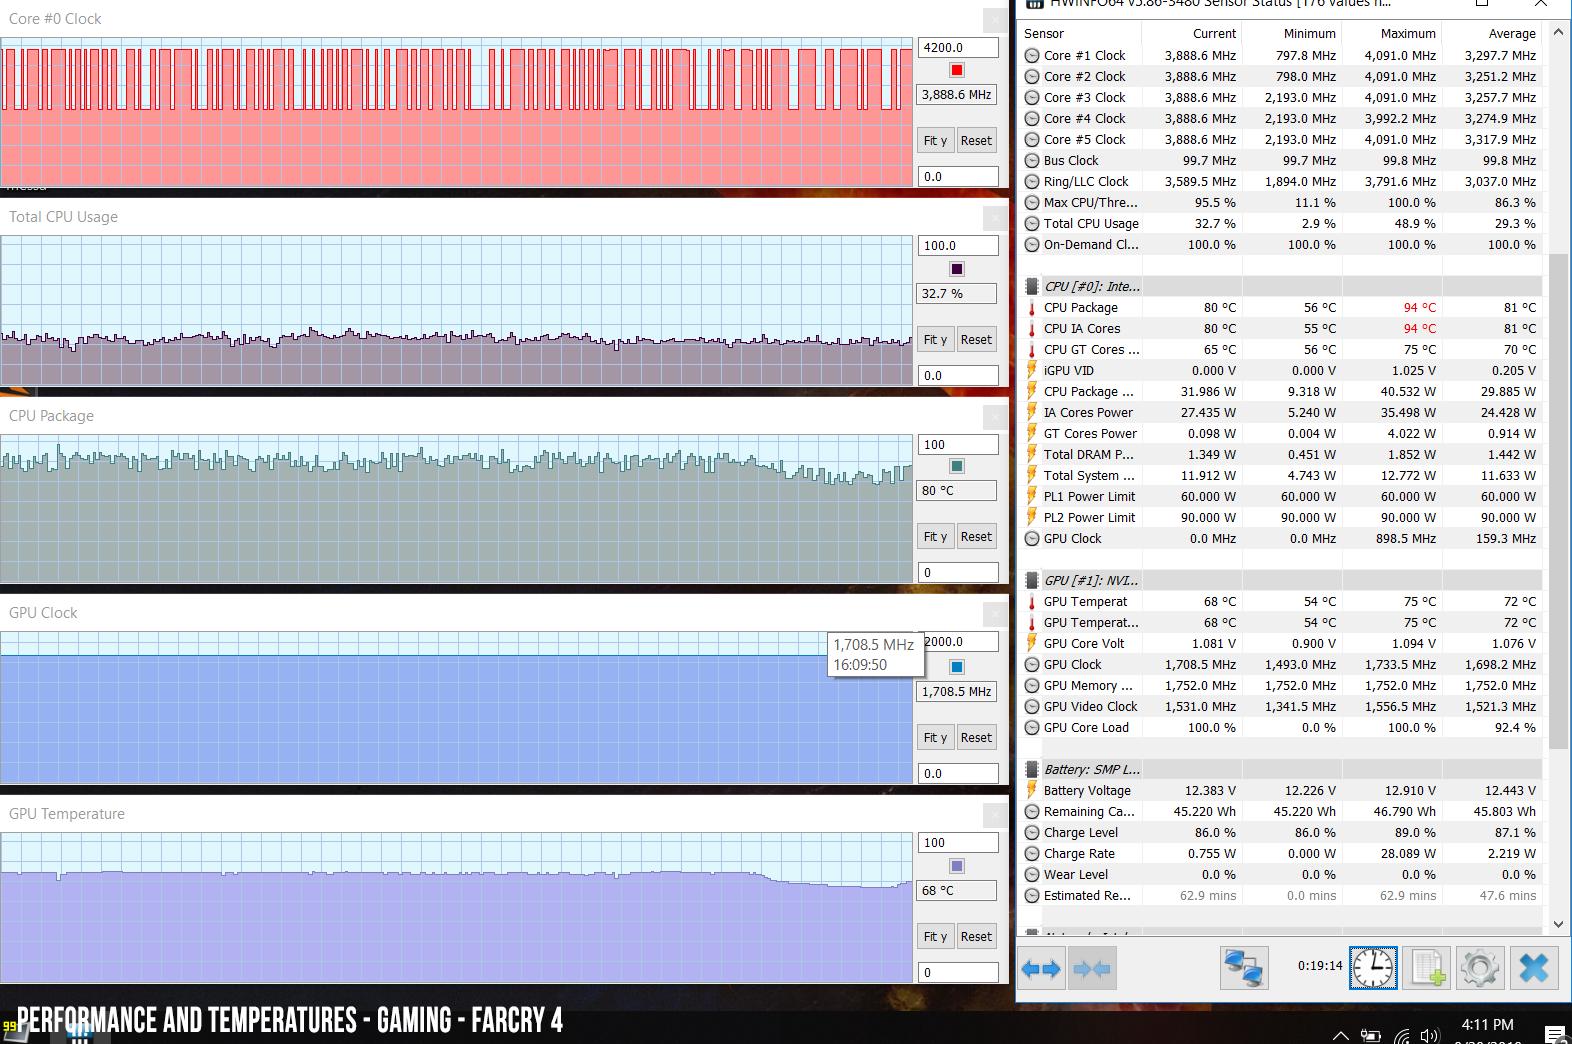 Lenovo Legion Y530 review (i7-8570H, GTX 1050 Ti, FHD 60 Hz